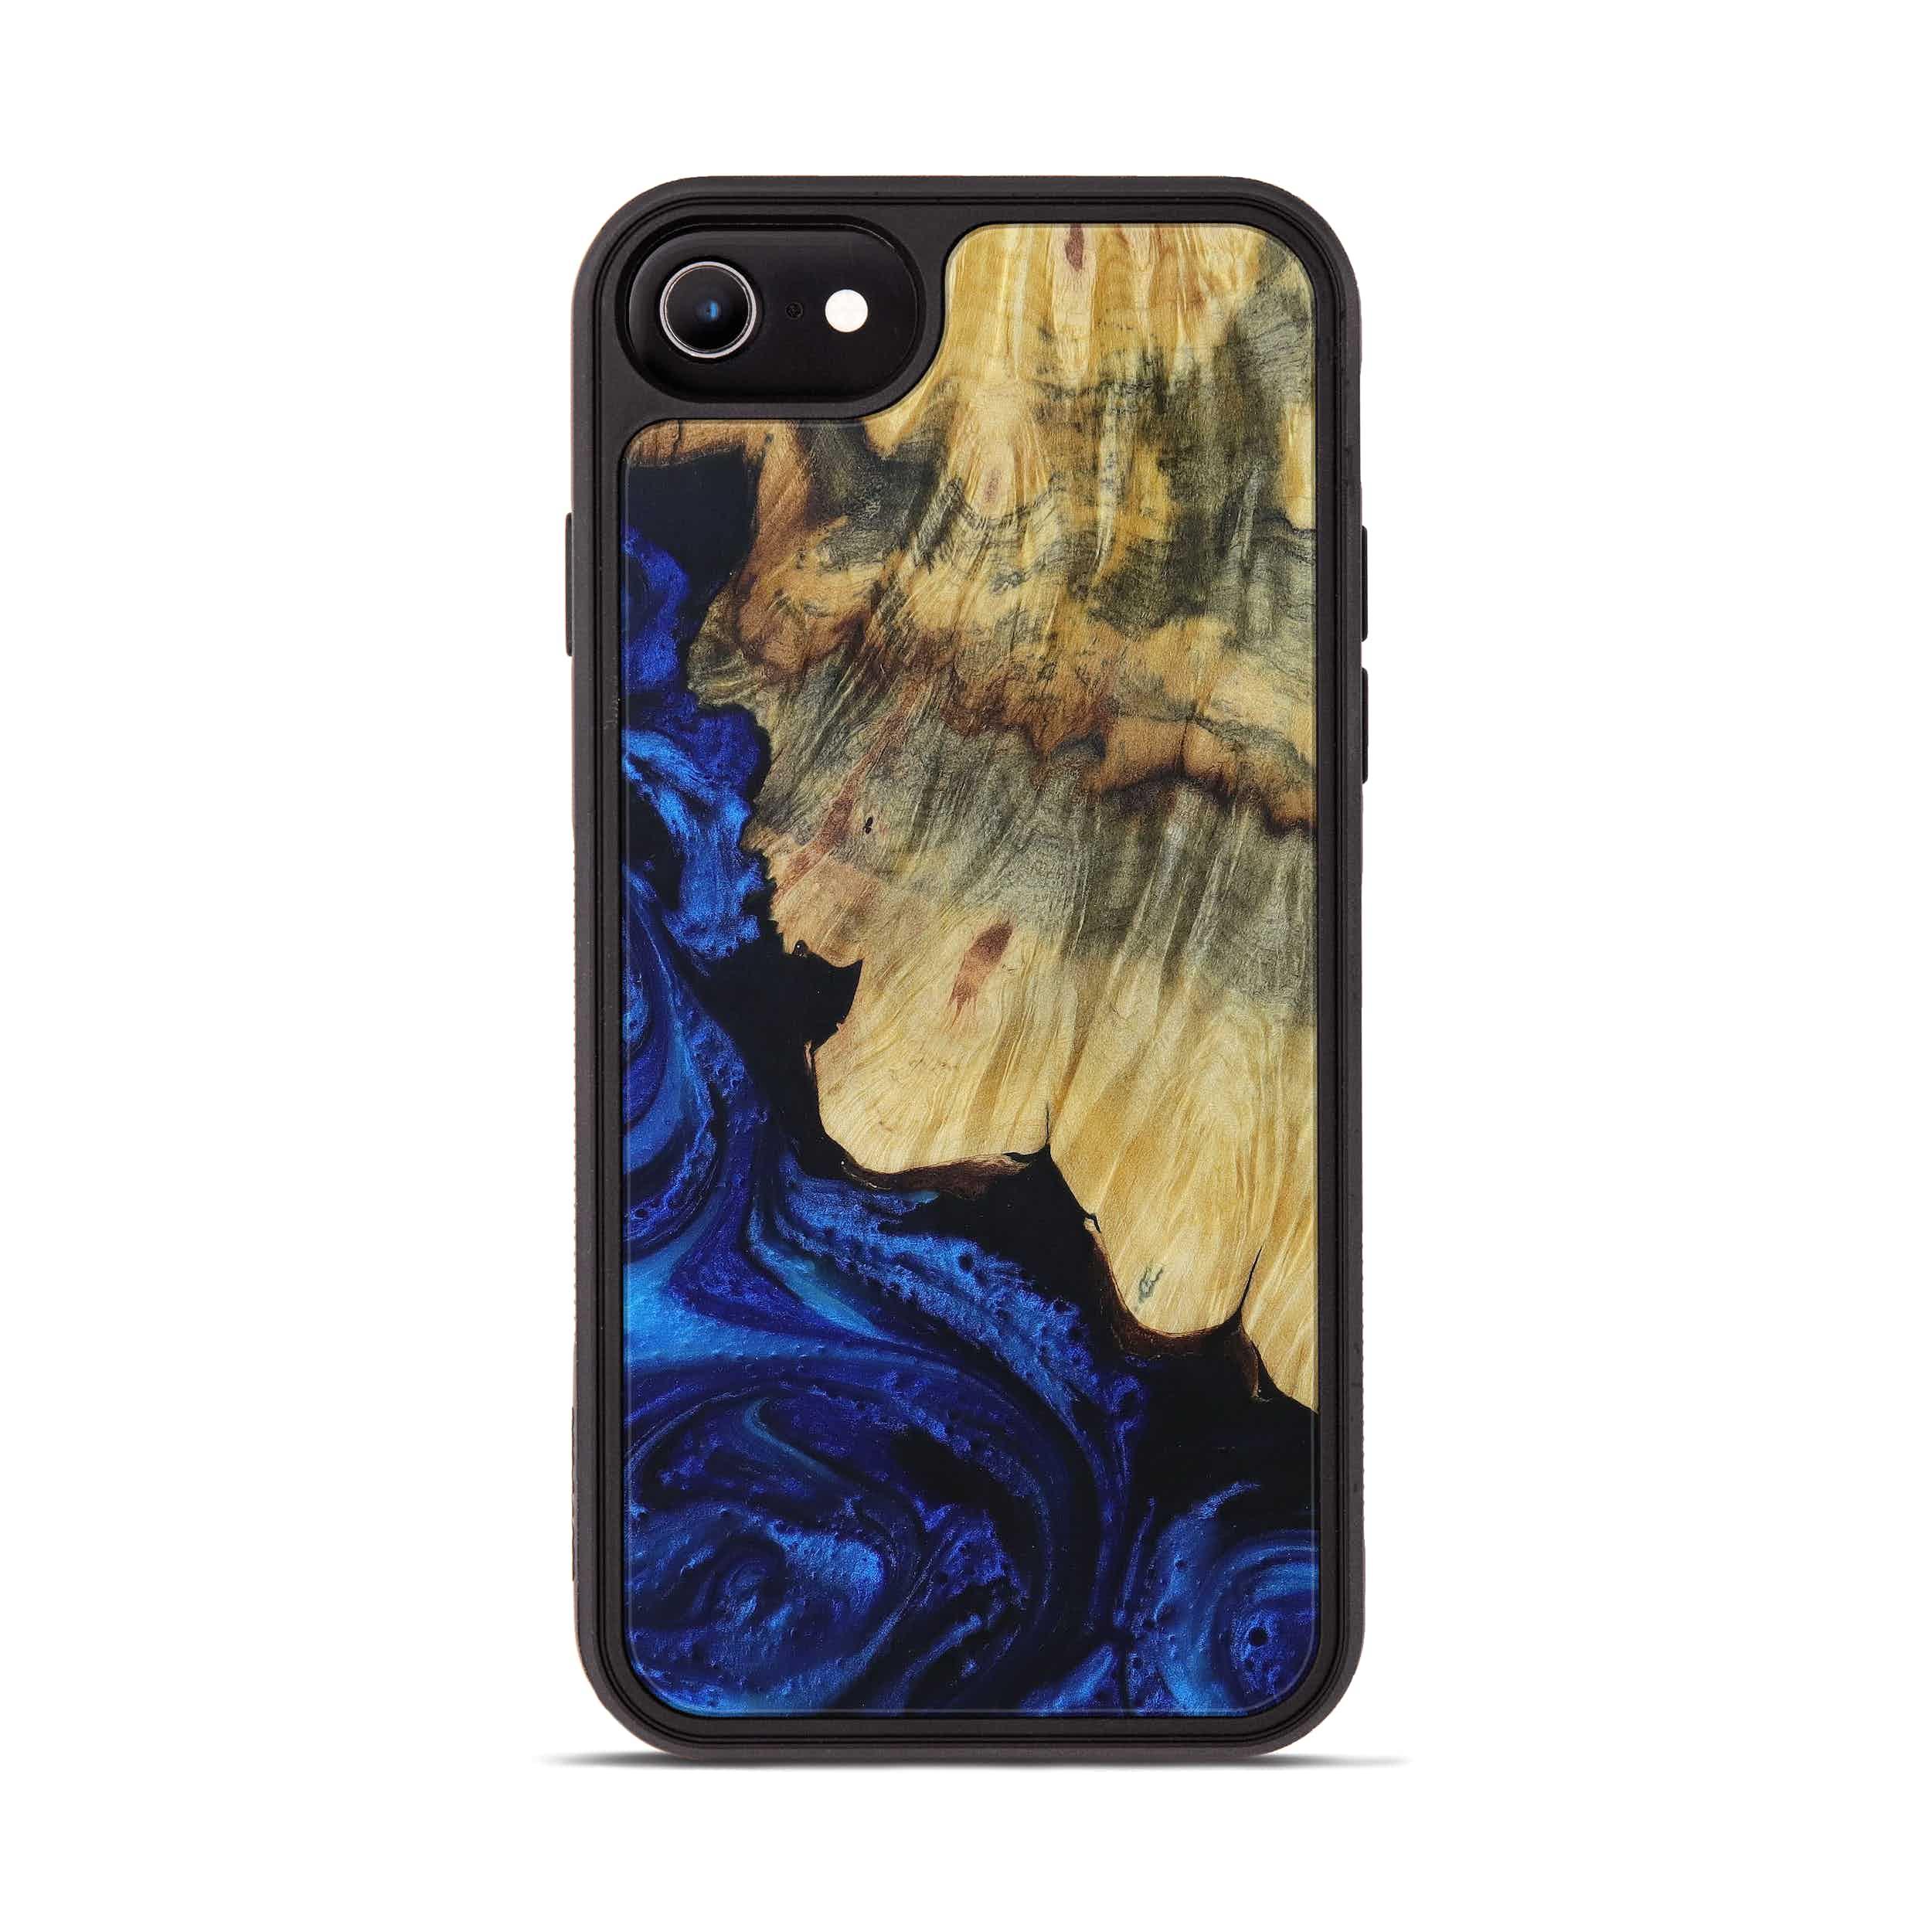 iPhone 7 Wood+Resin Phone Case - Wassim (Dark Blue, 399845)